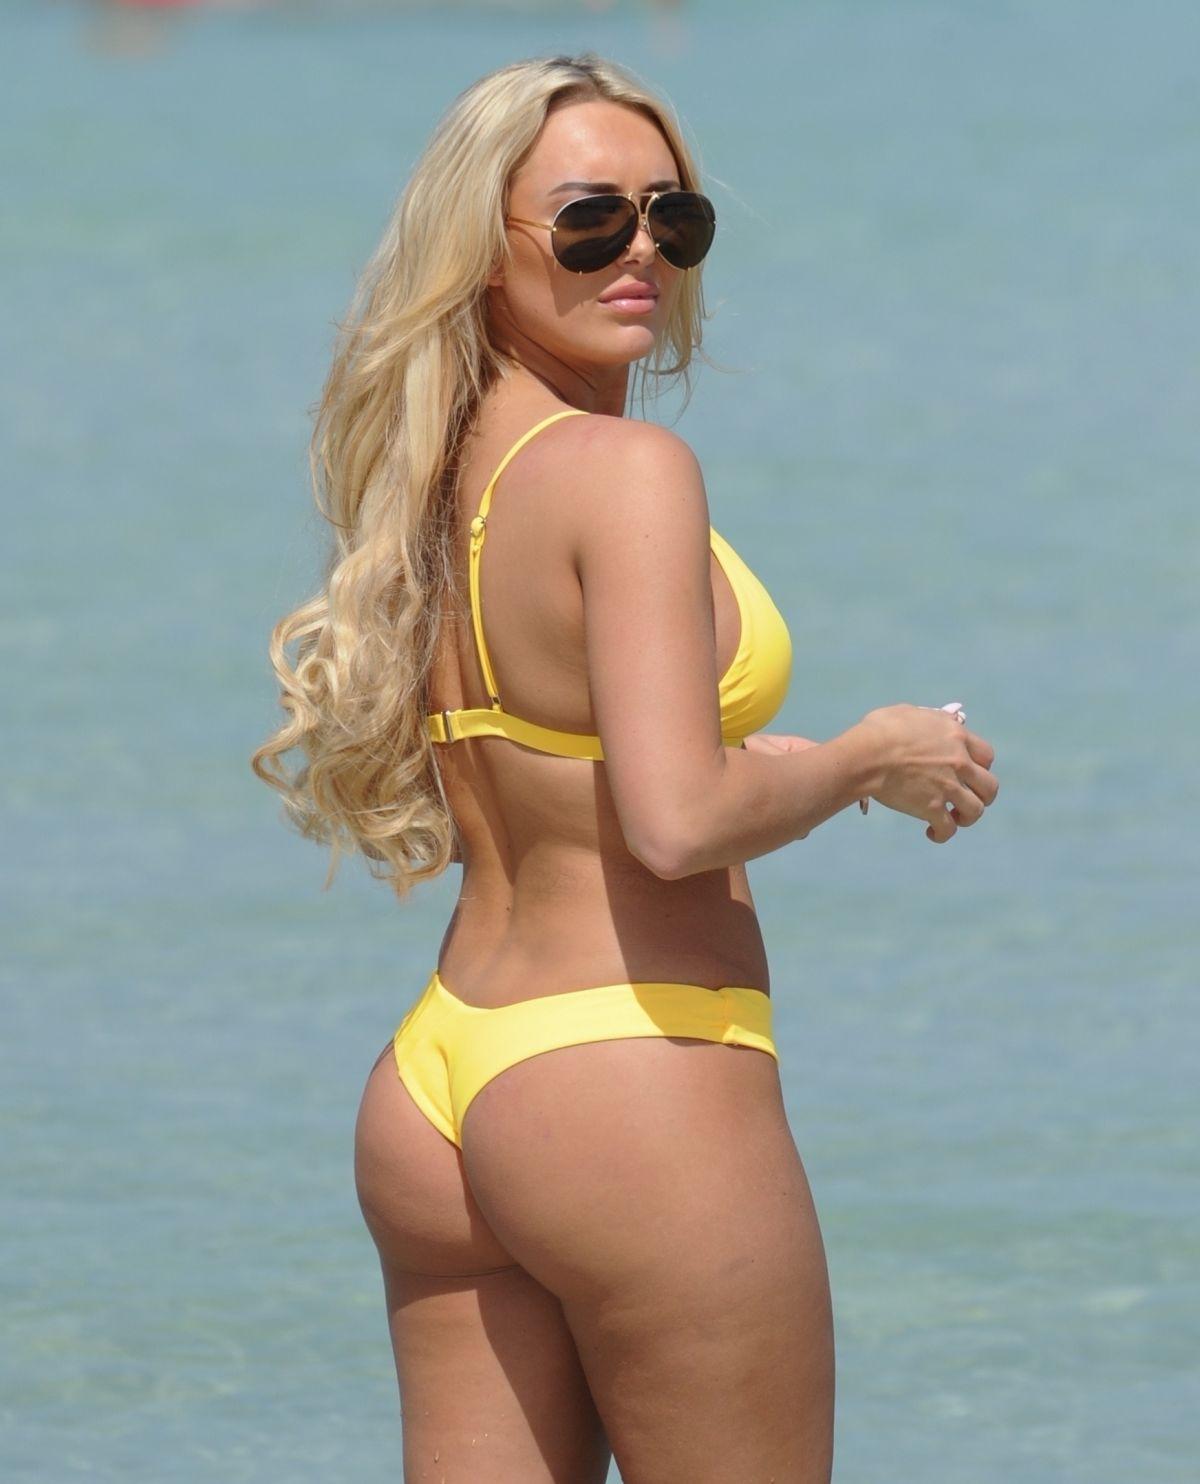 ec75e562cd12a AMBER TURNER in Yellow Bikini at a Beach in Dubai 03 09 2018 ...